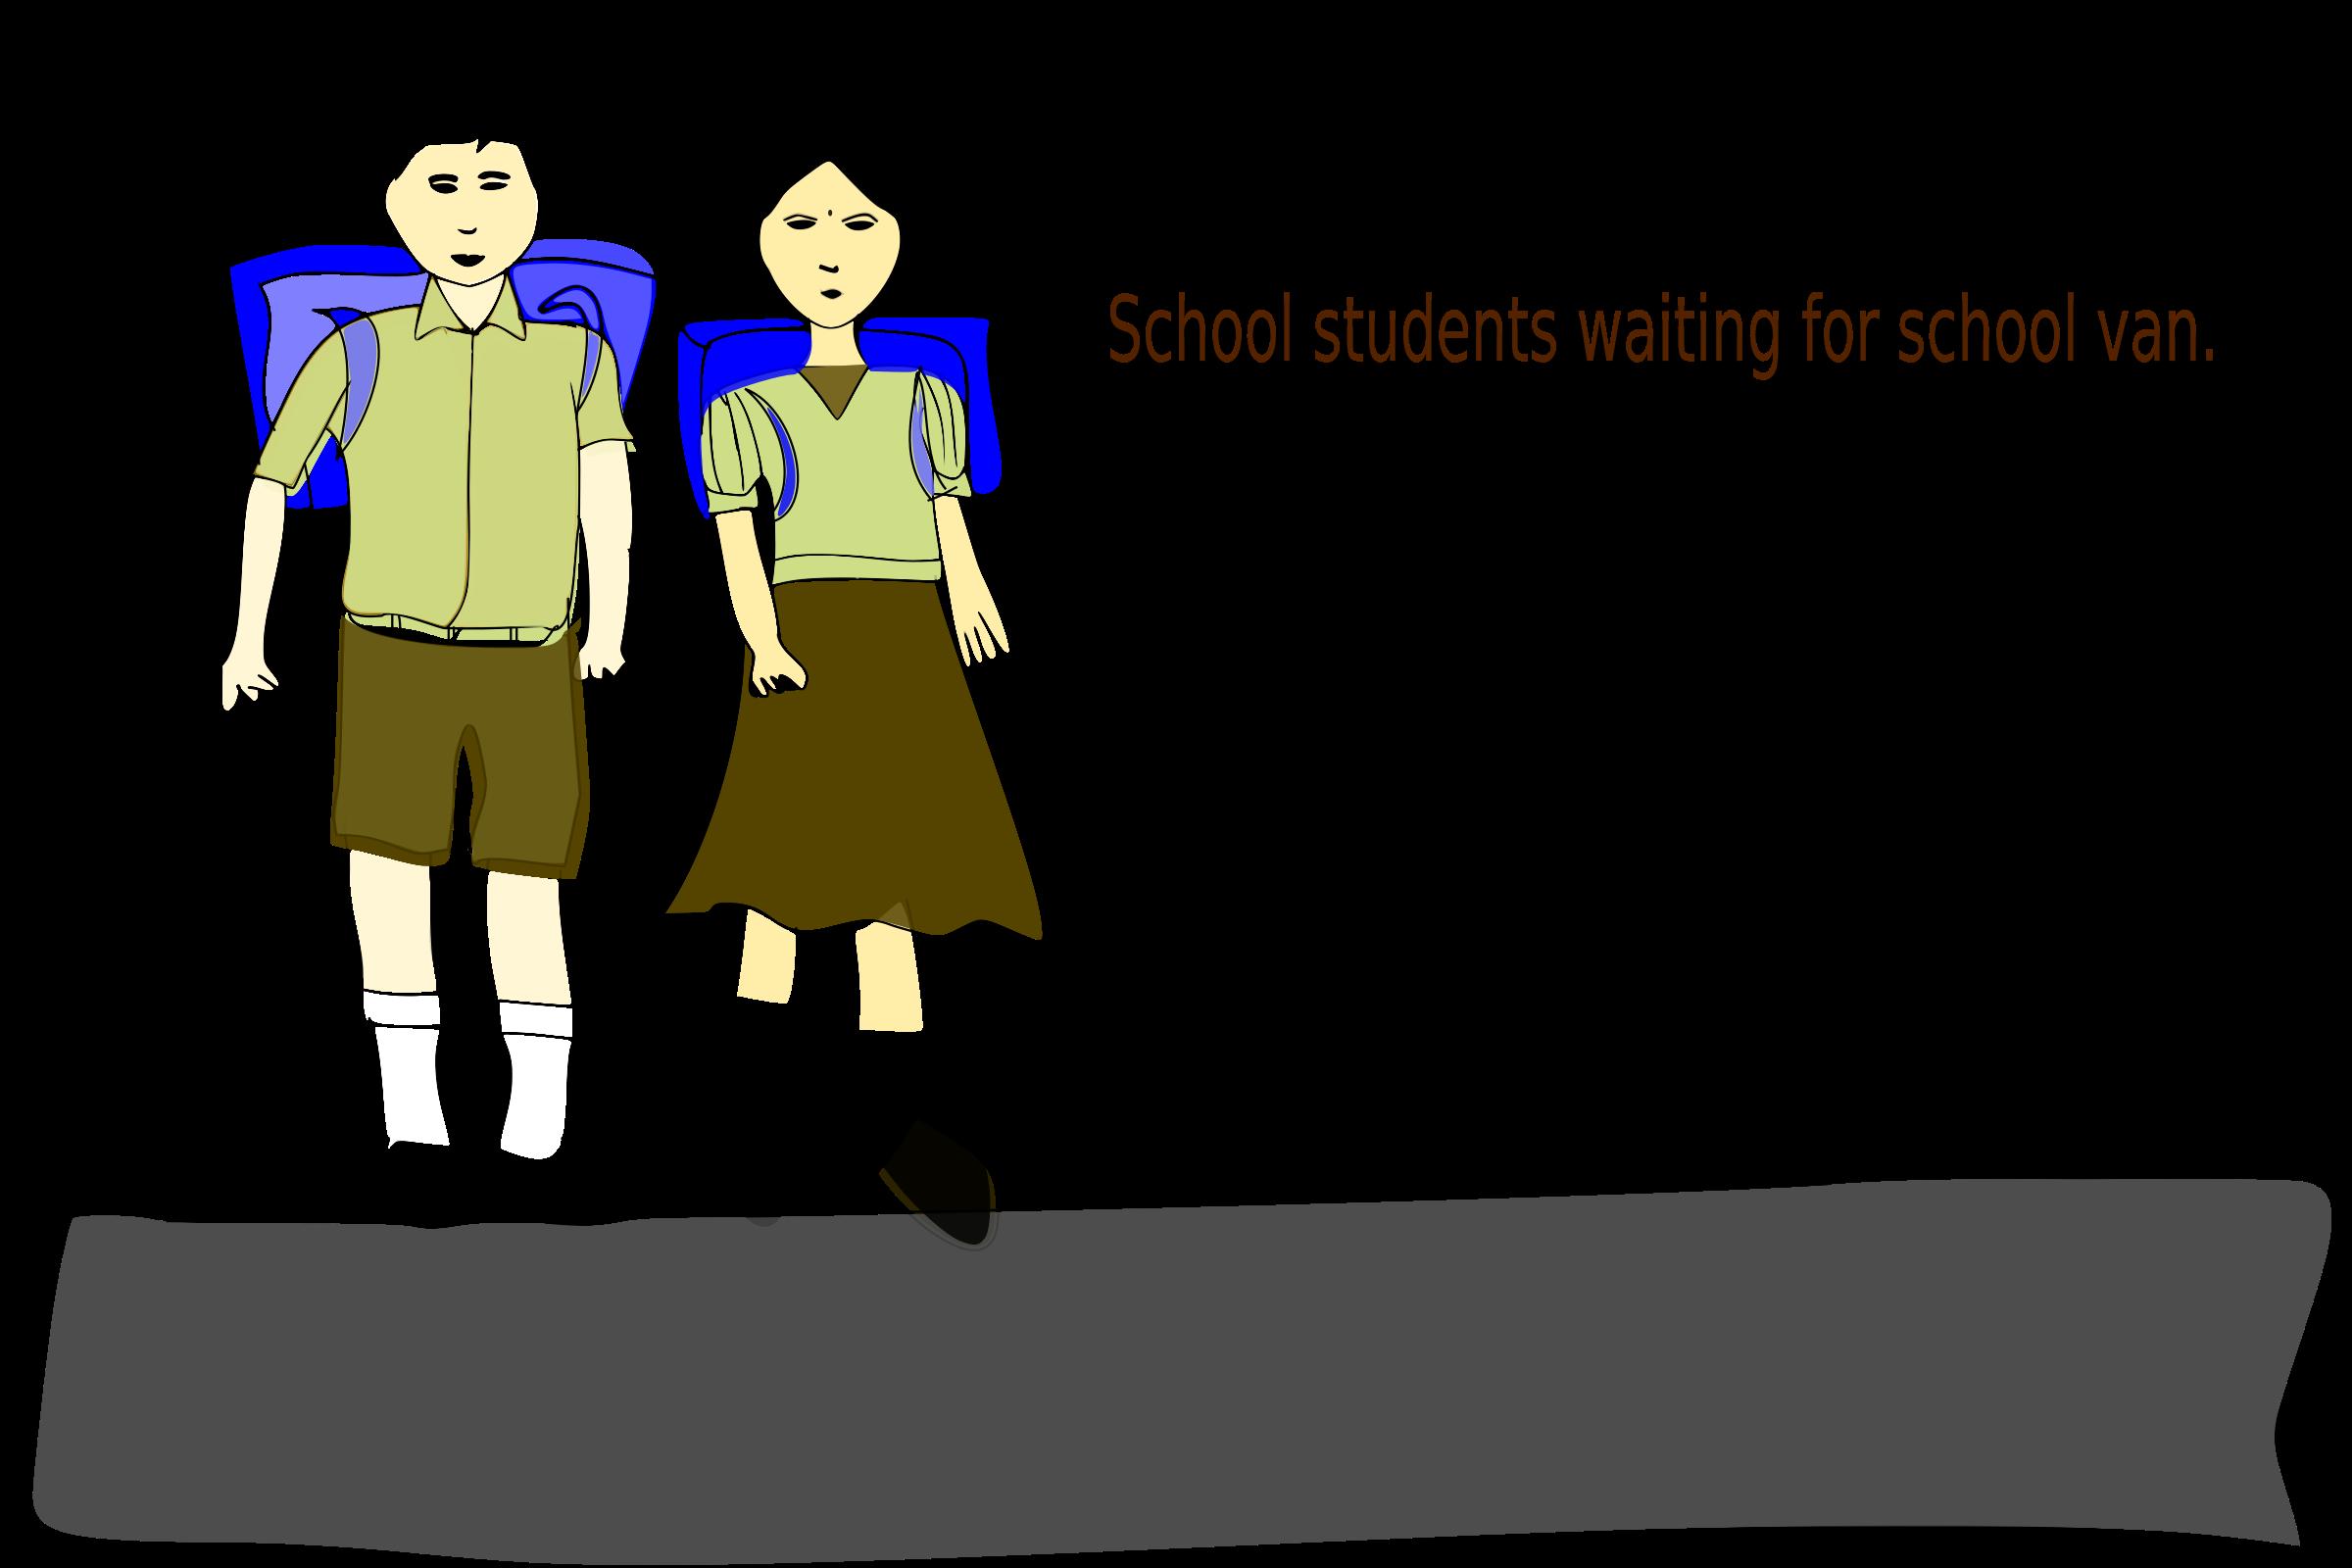 School students clipart jpg stock Clipart - School Students jpg stock